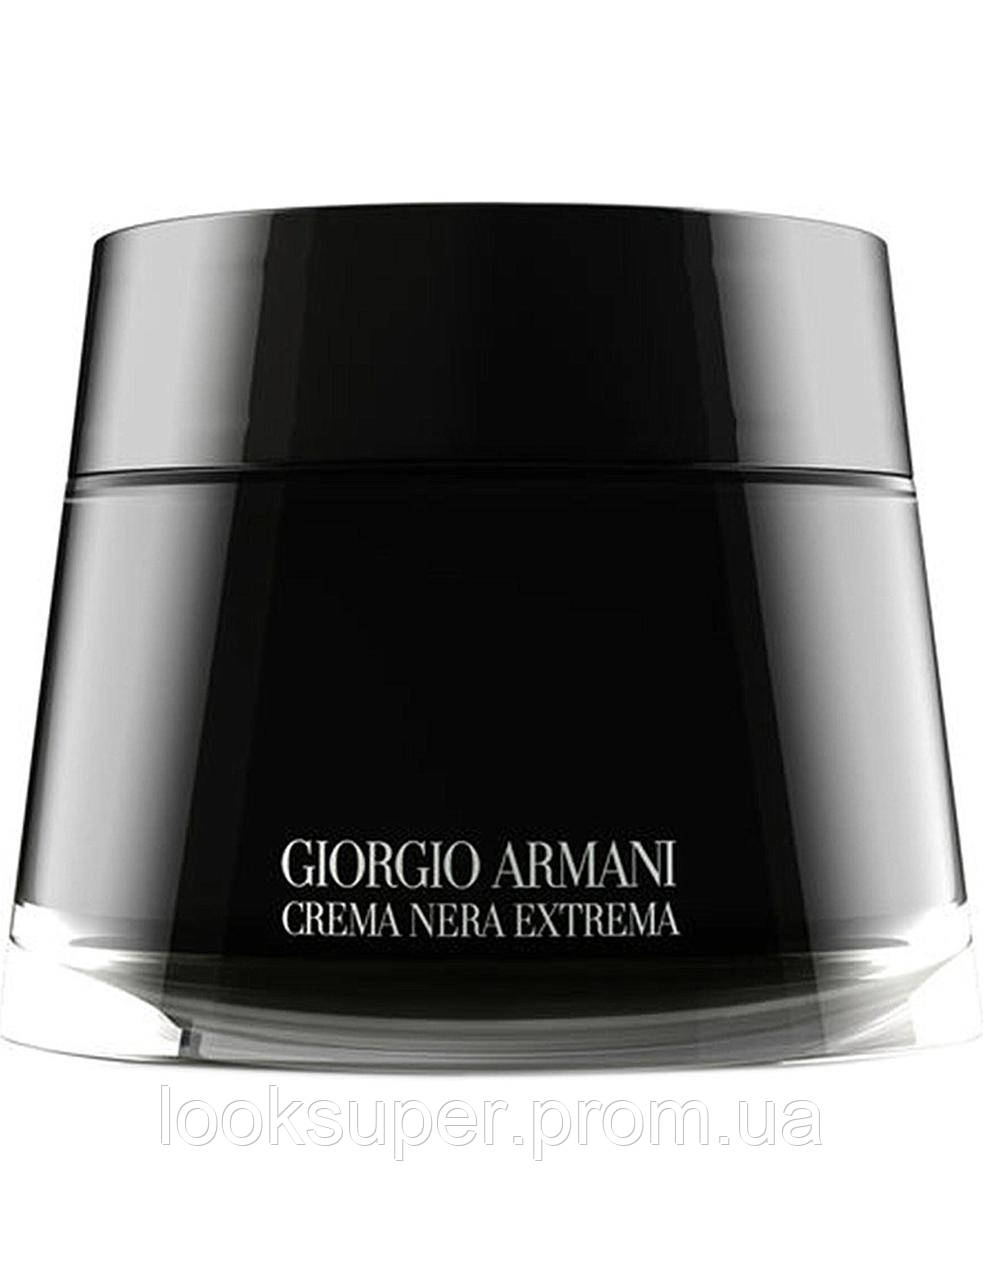 Крем GIORGIO ARMANI Crema Nera Extrema supreme cream 50ml